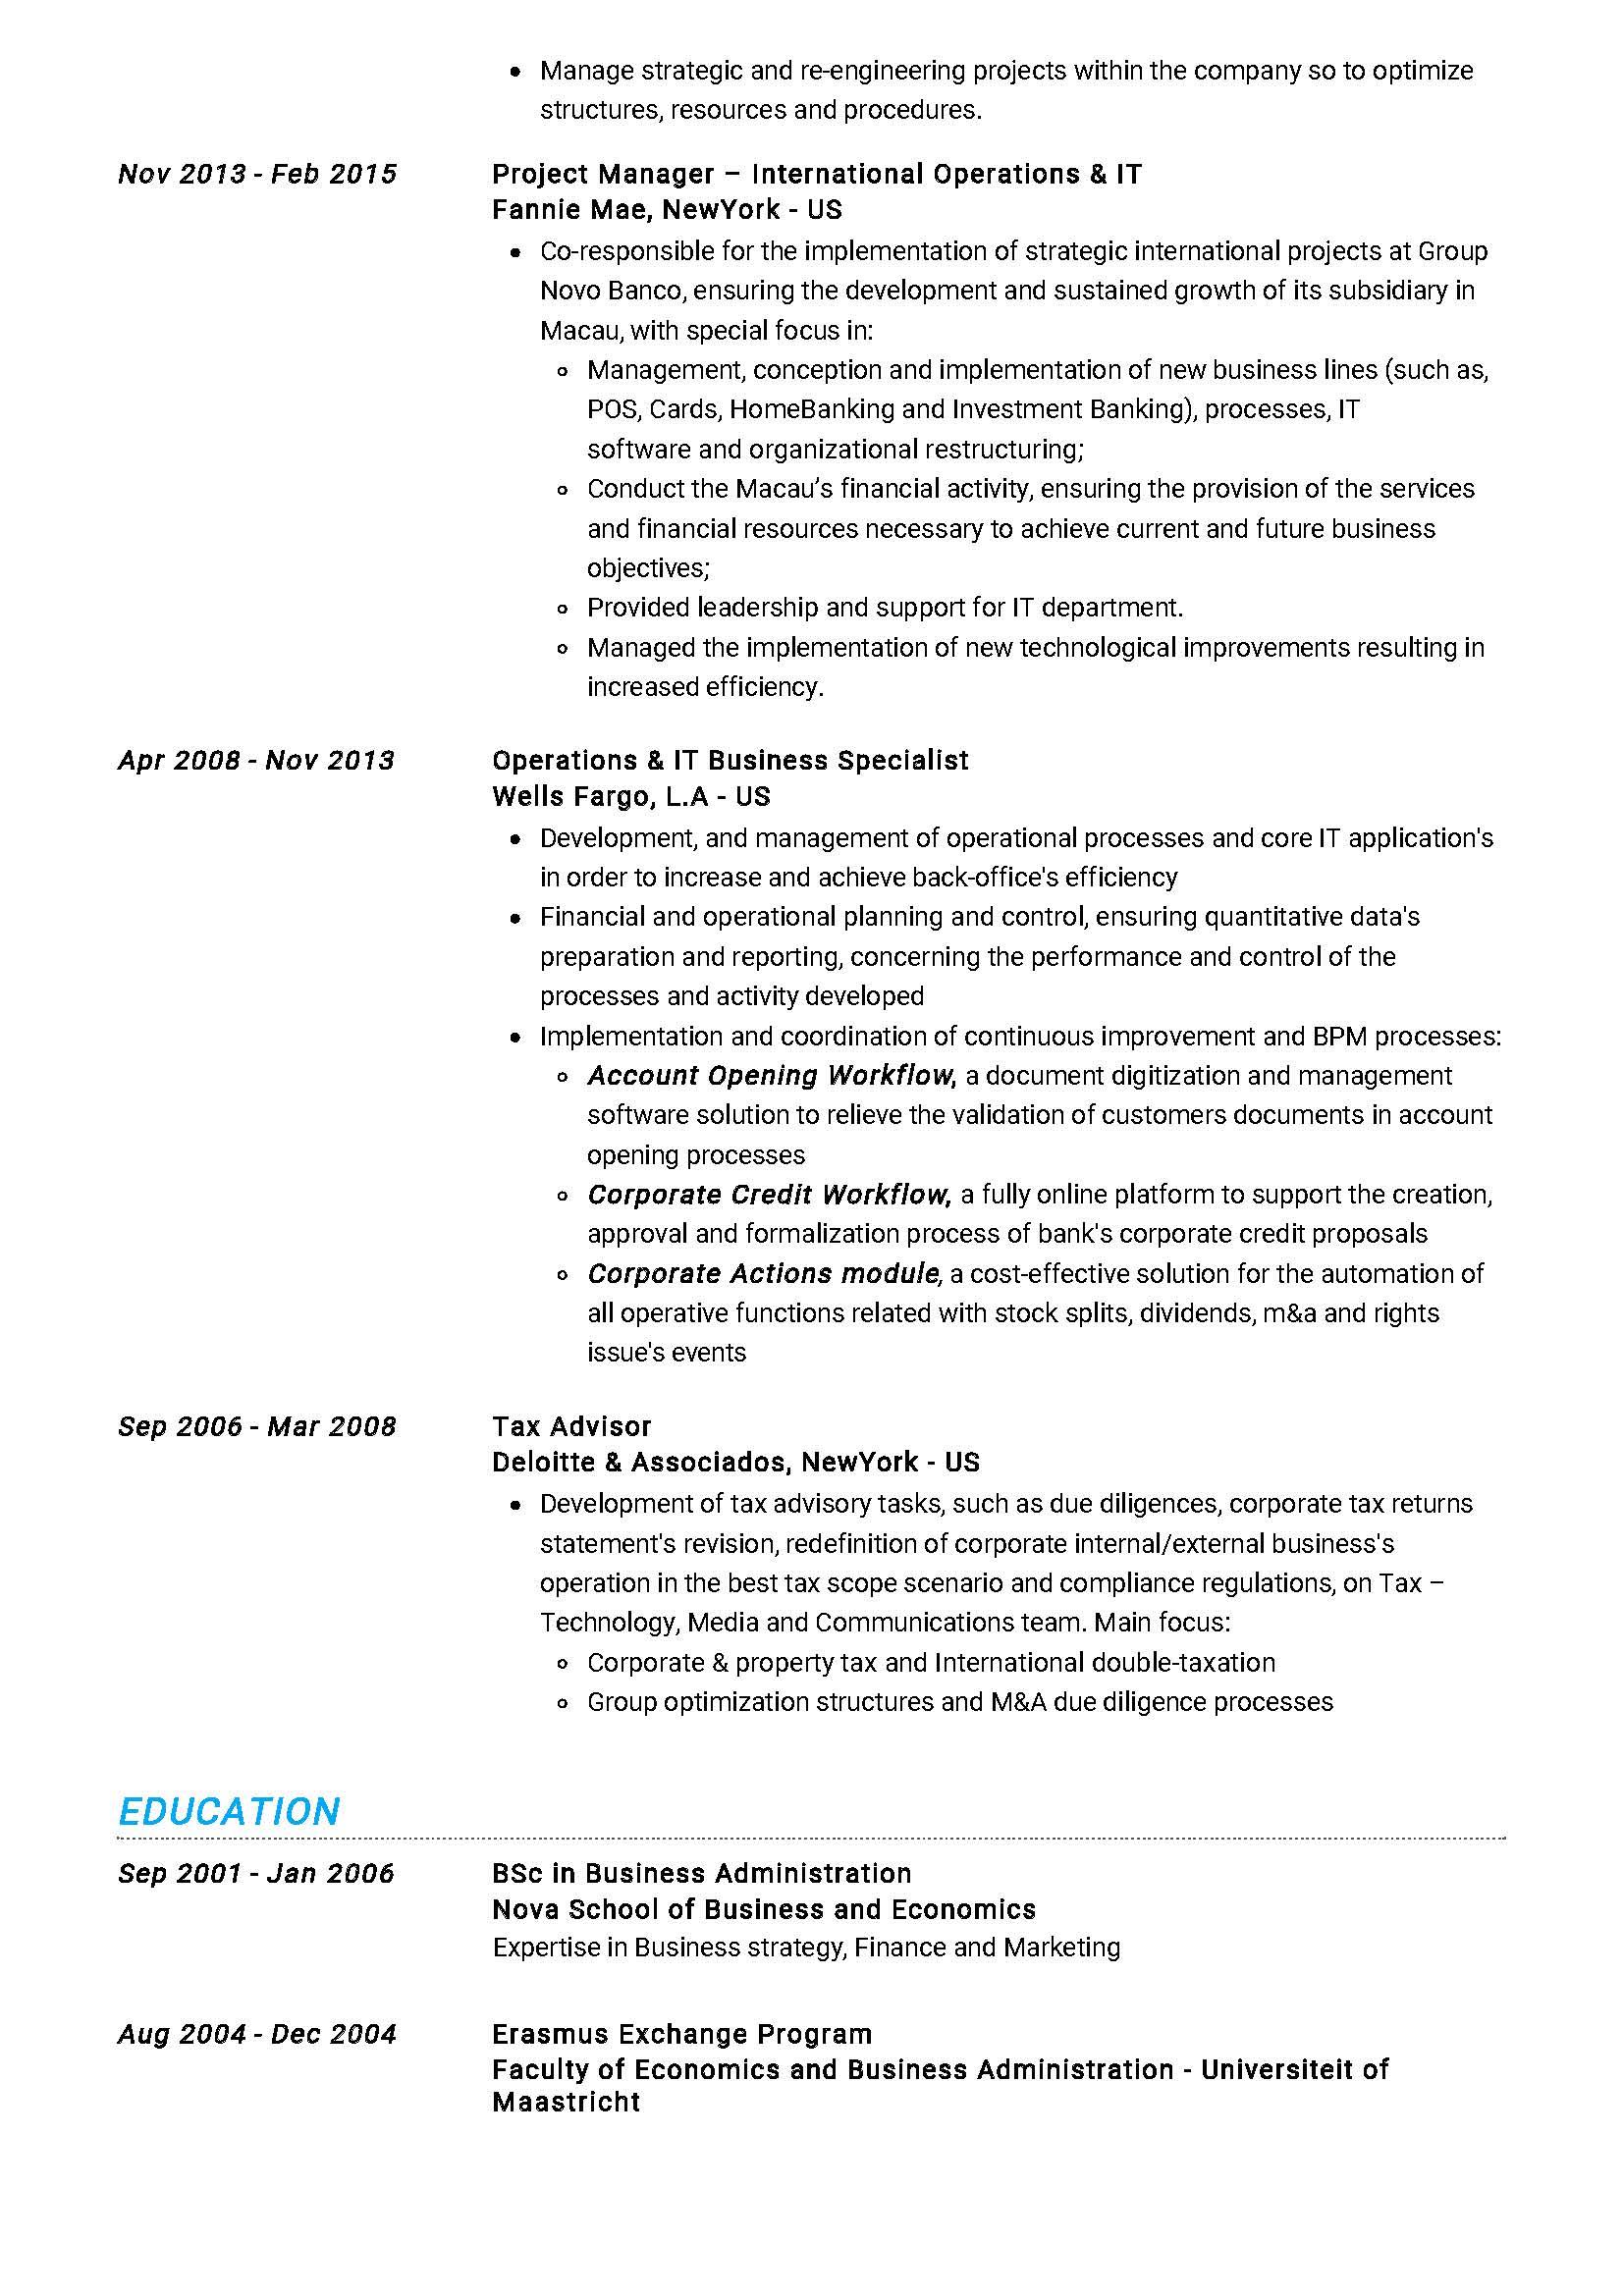 Project Manager Resume Sample Writing Tips 2020 Resumekraft